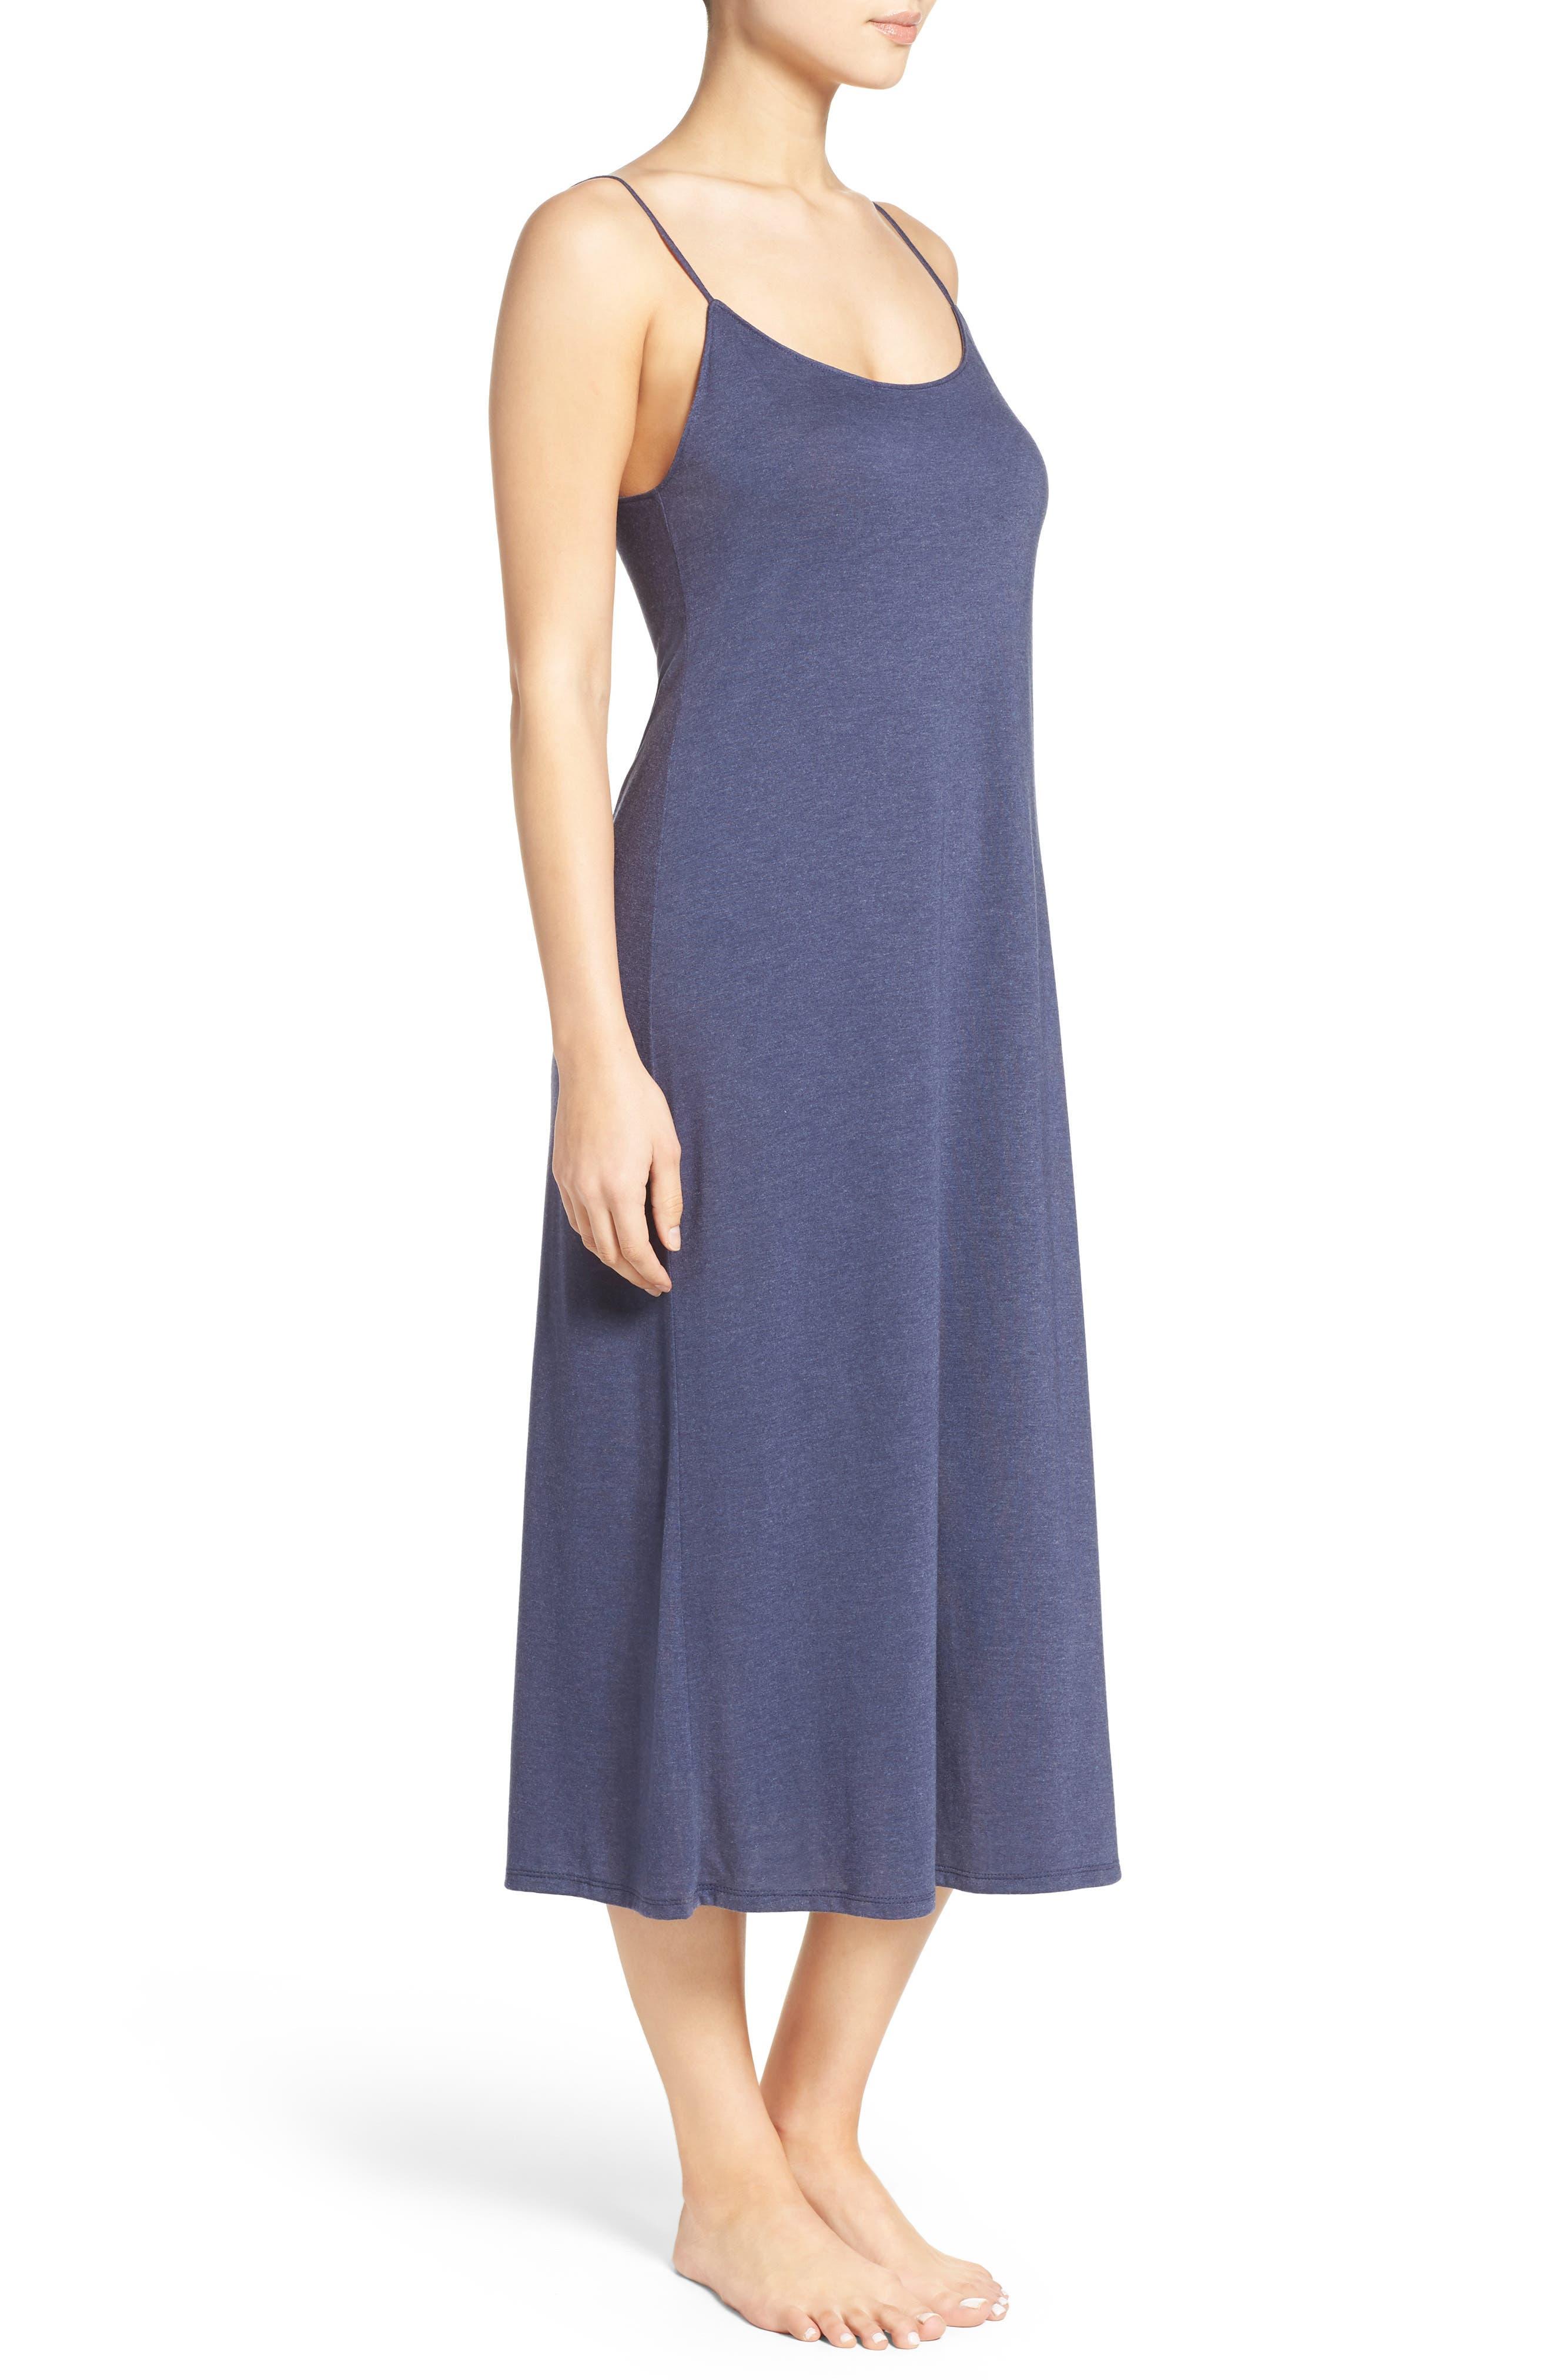 Shangri La Nightgown,                             Alternate thumbnail 3, color,                             Heather Night Blue